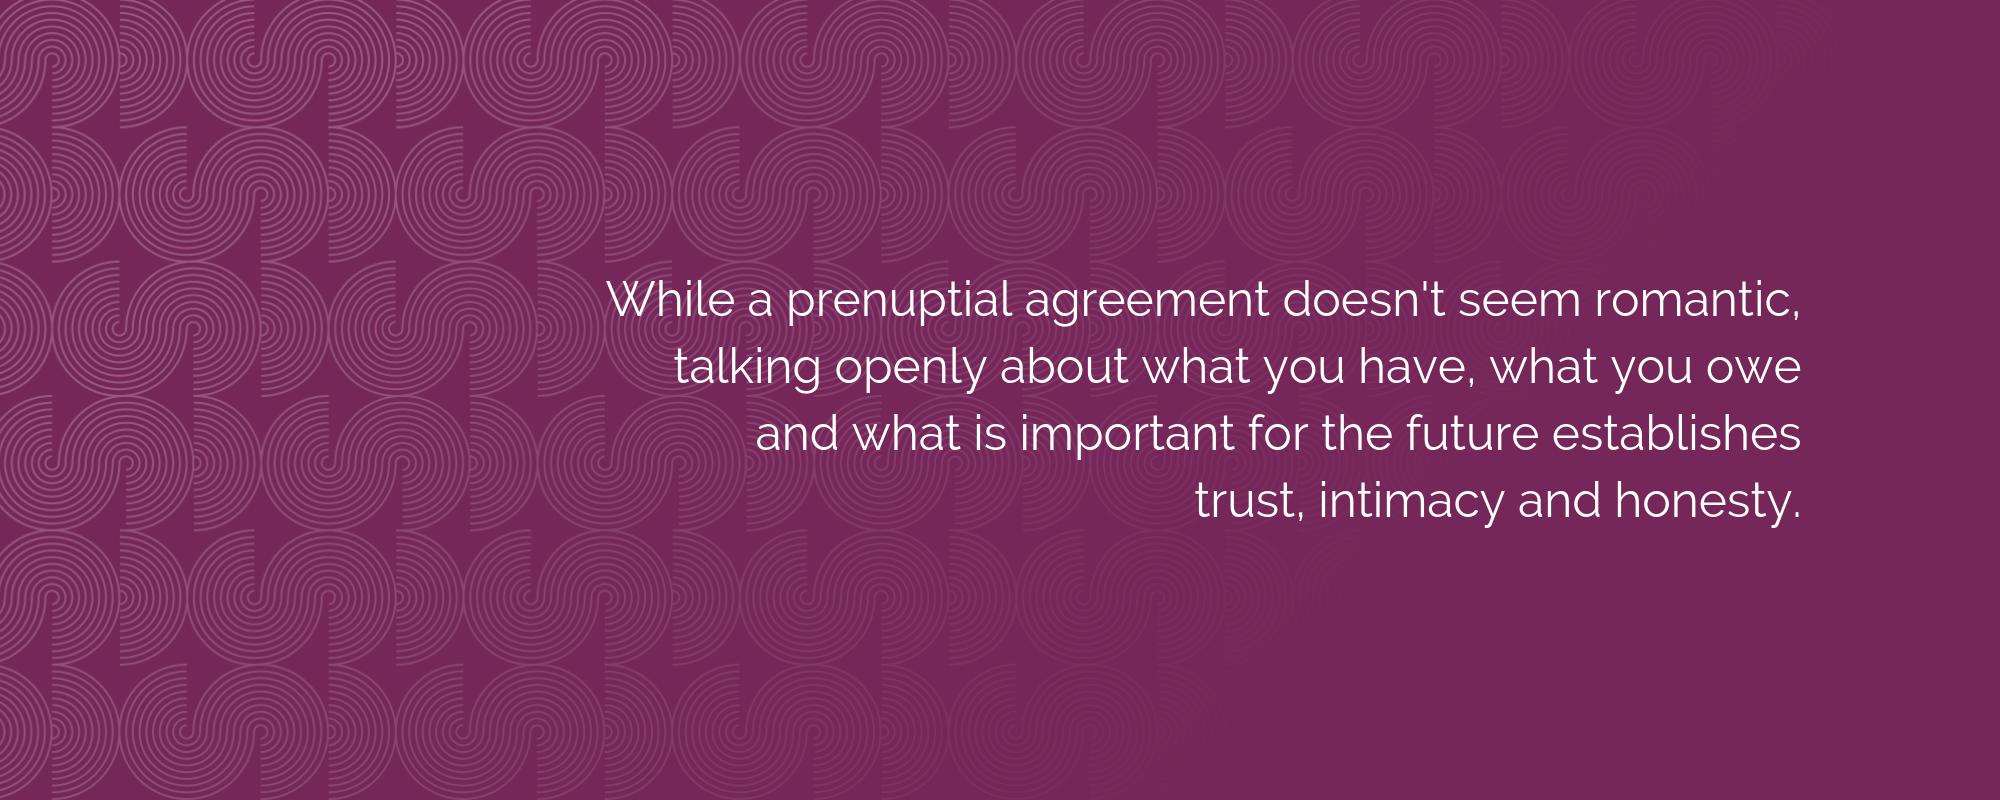 Prenups and romance: How a financial agreement enhances a